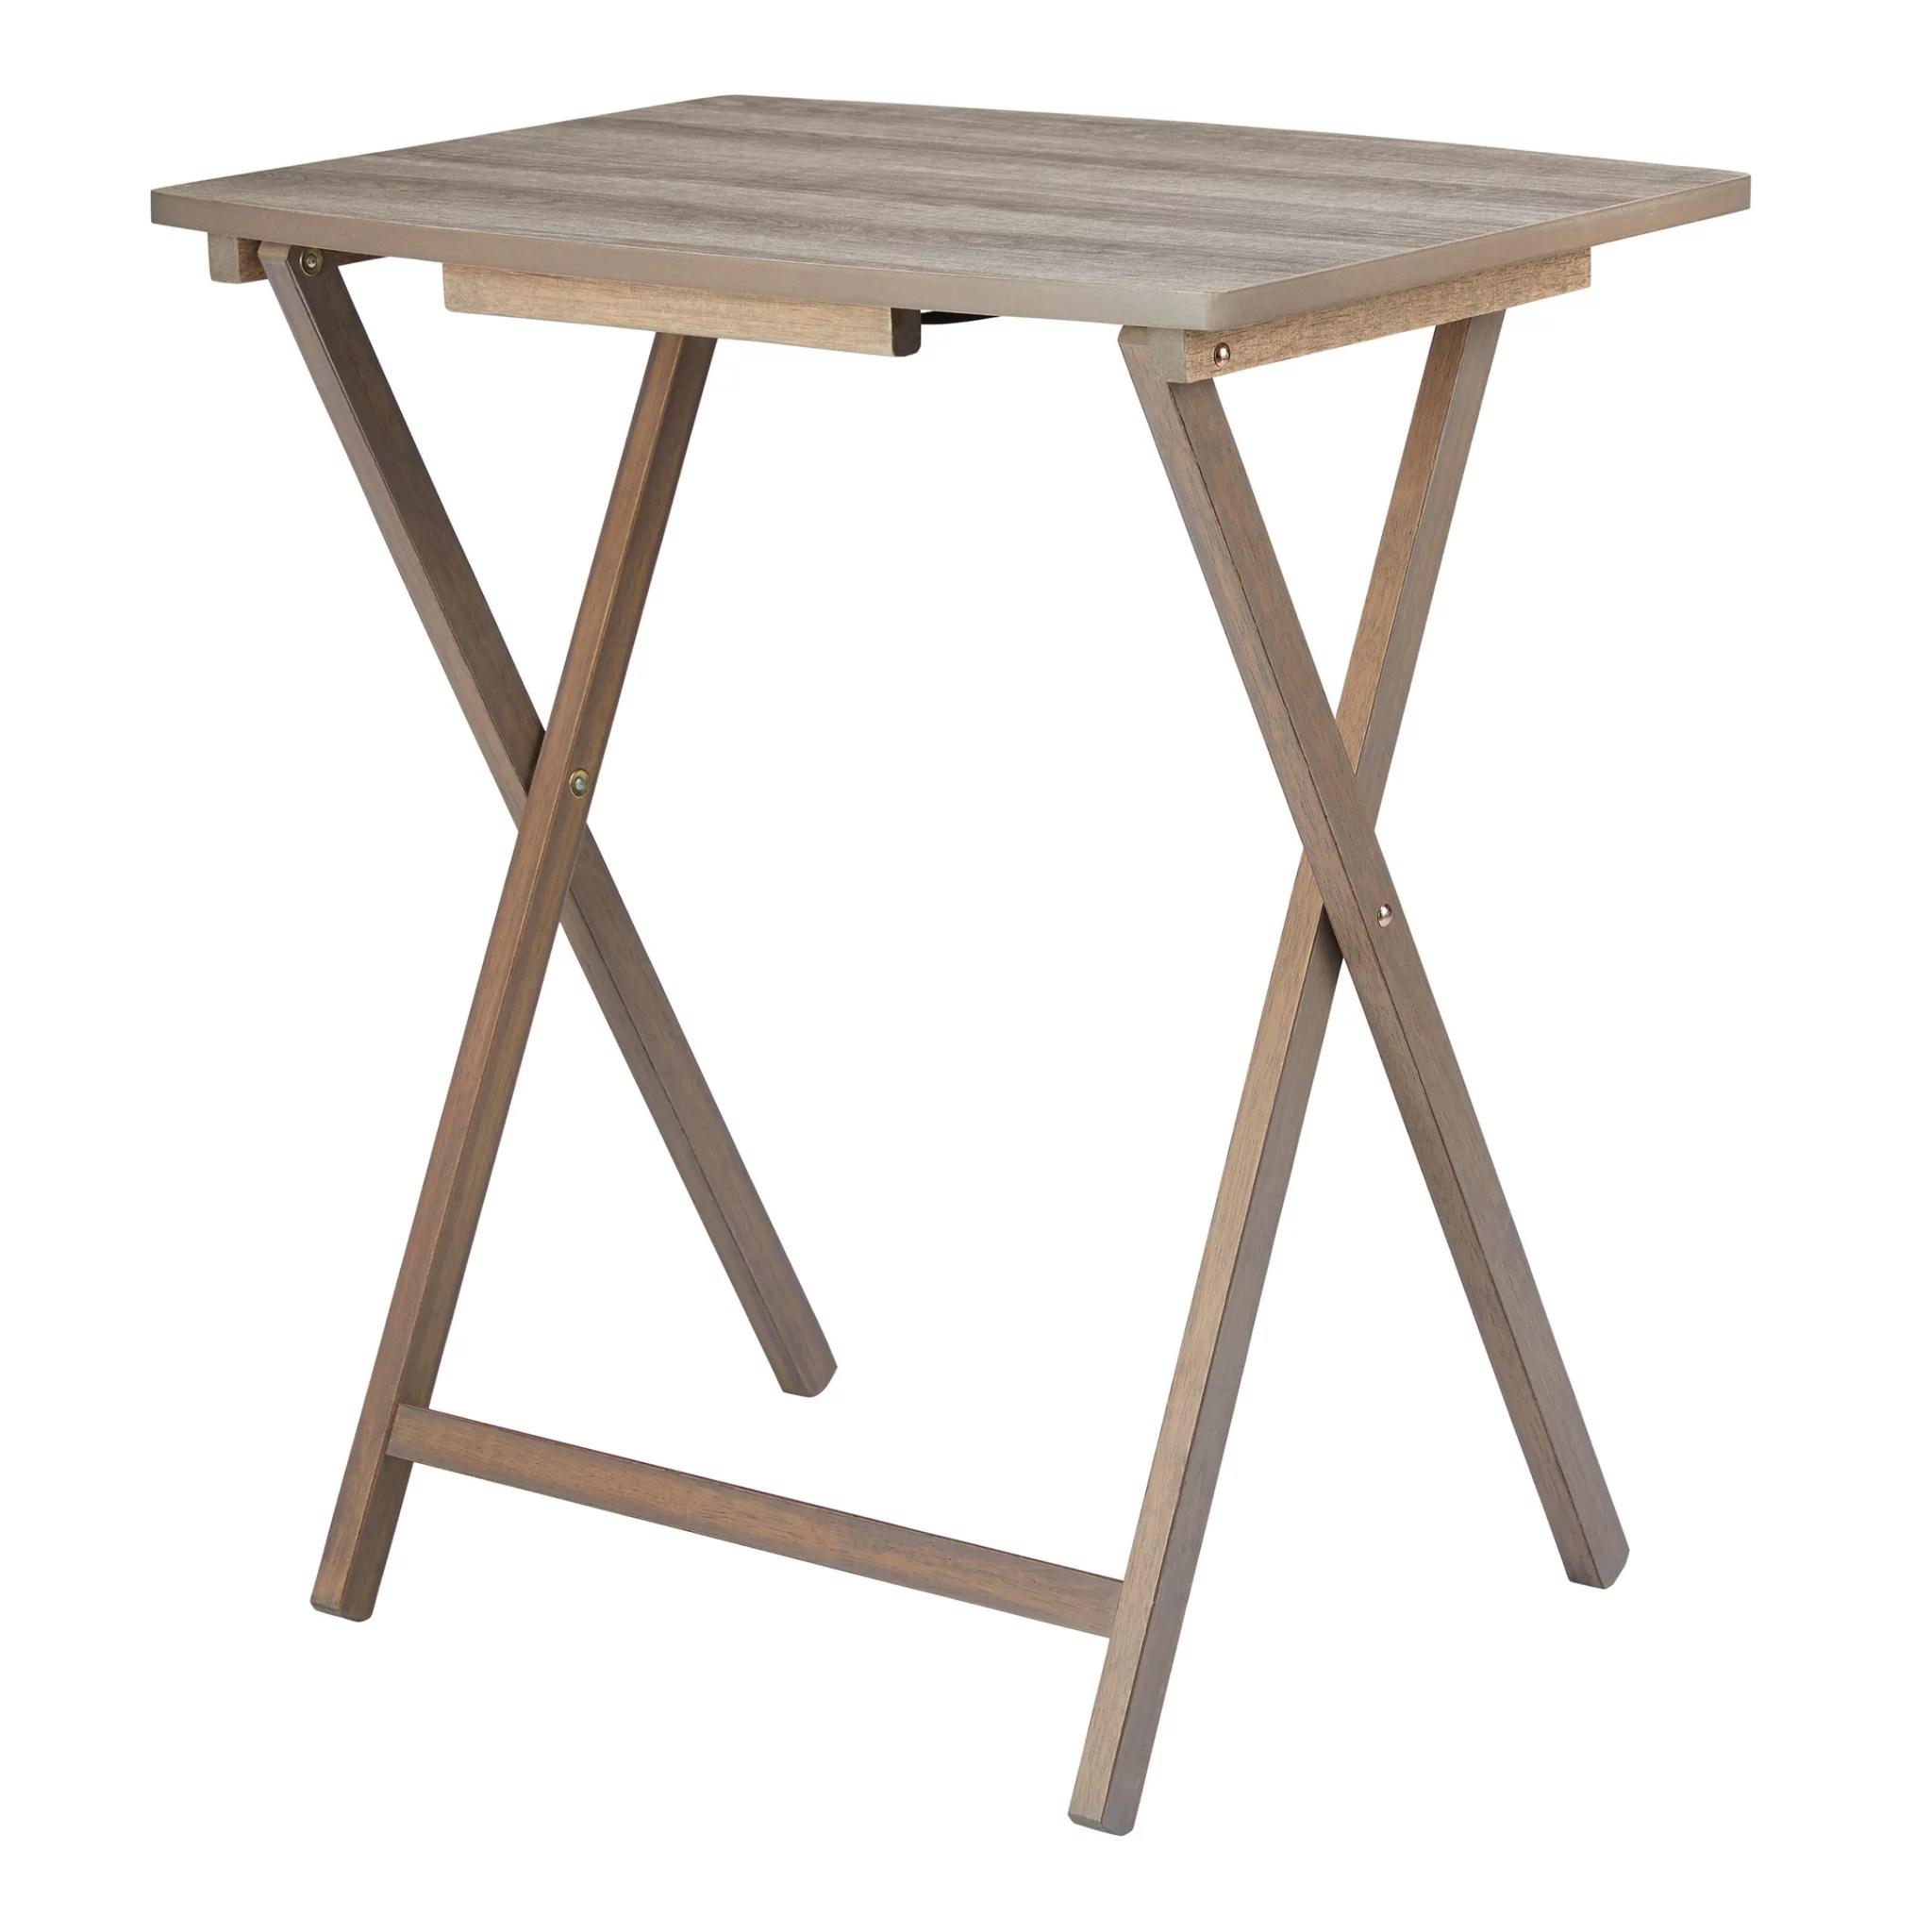 mainstays folding xl oversized tray table rustic gray walmart com